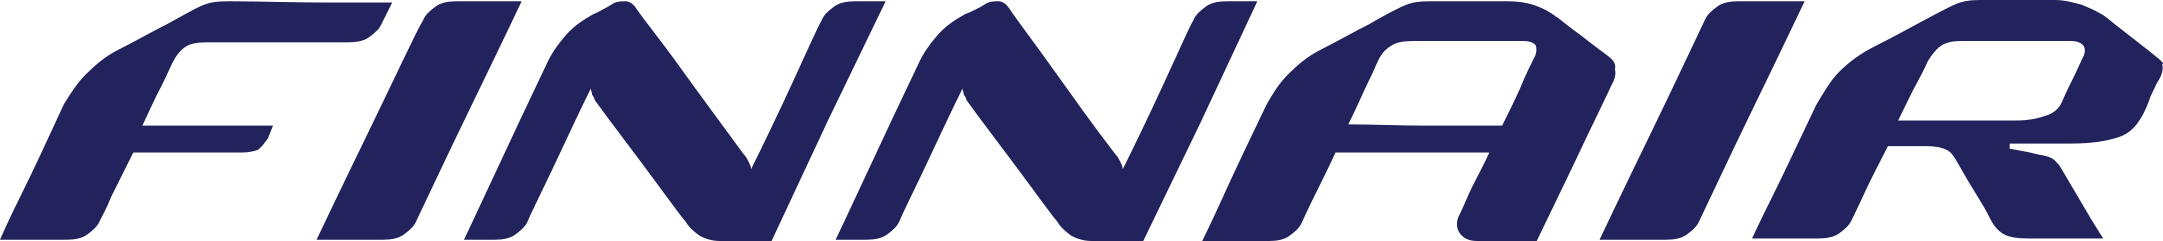 finnair logo 1 - Finnair Logo